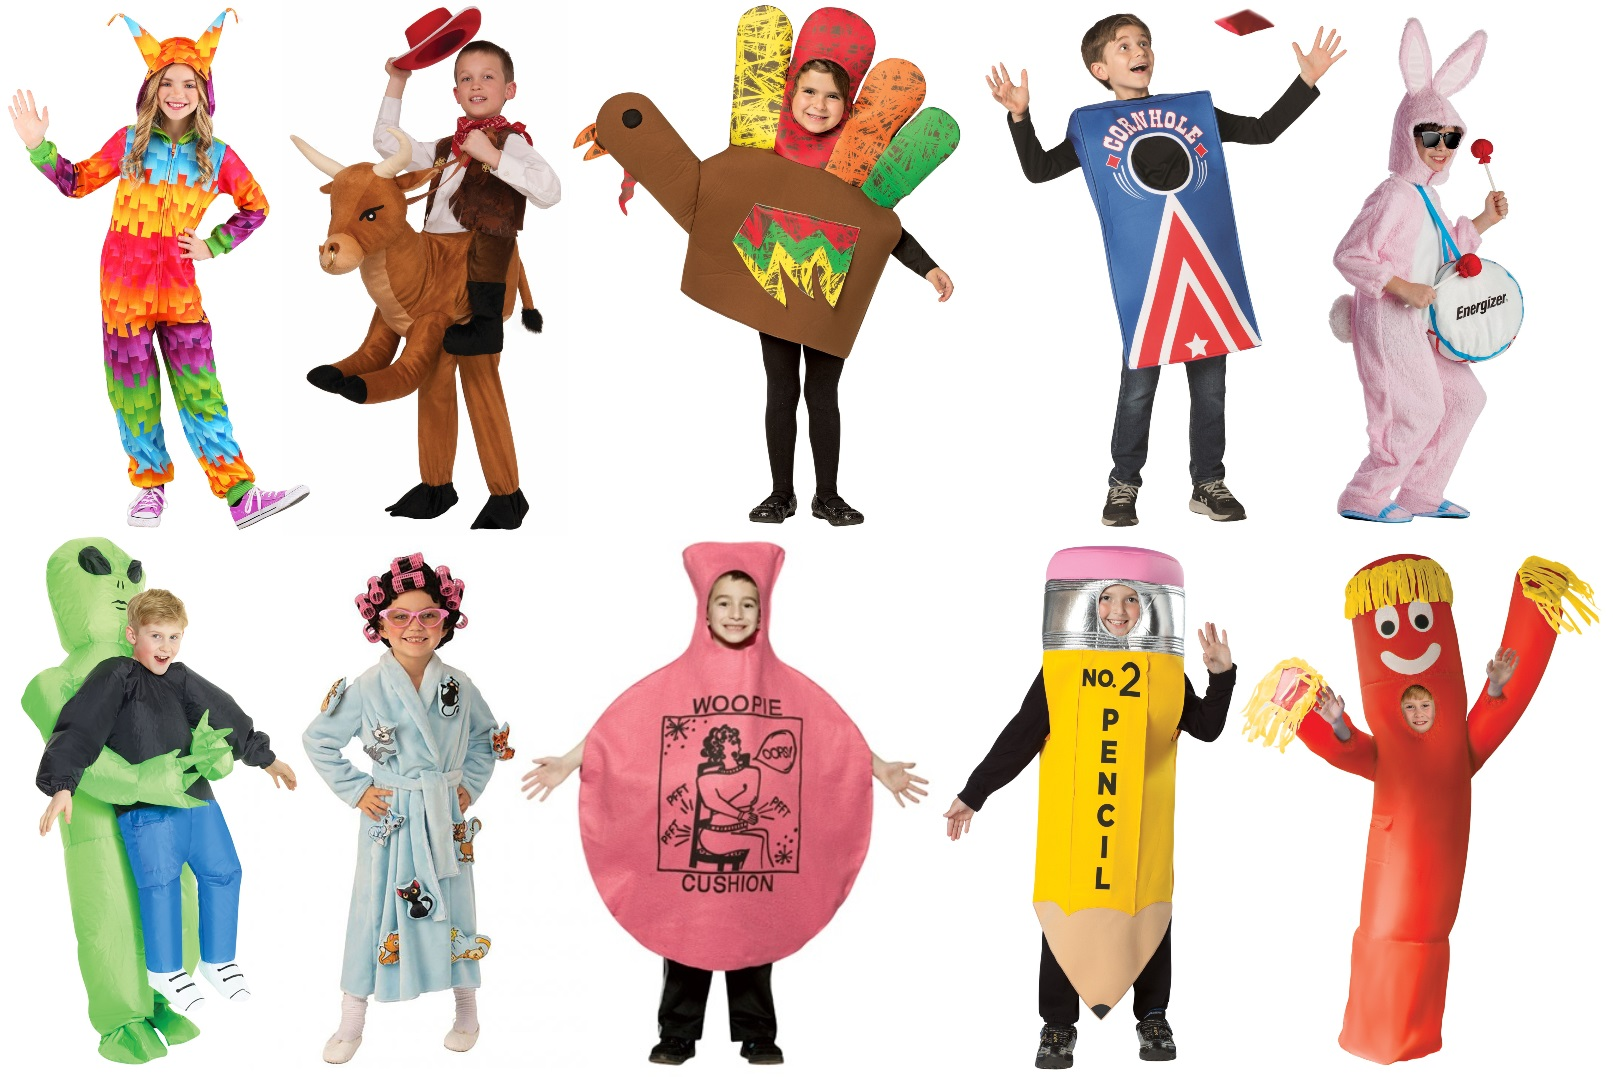 Funny Kids' Halloween Costumes